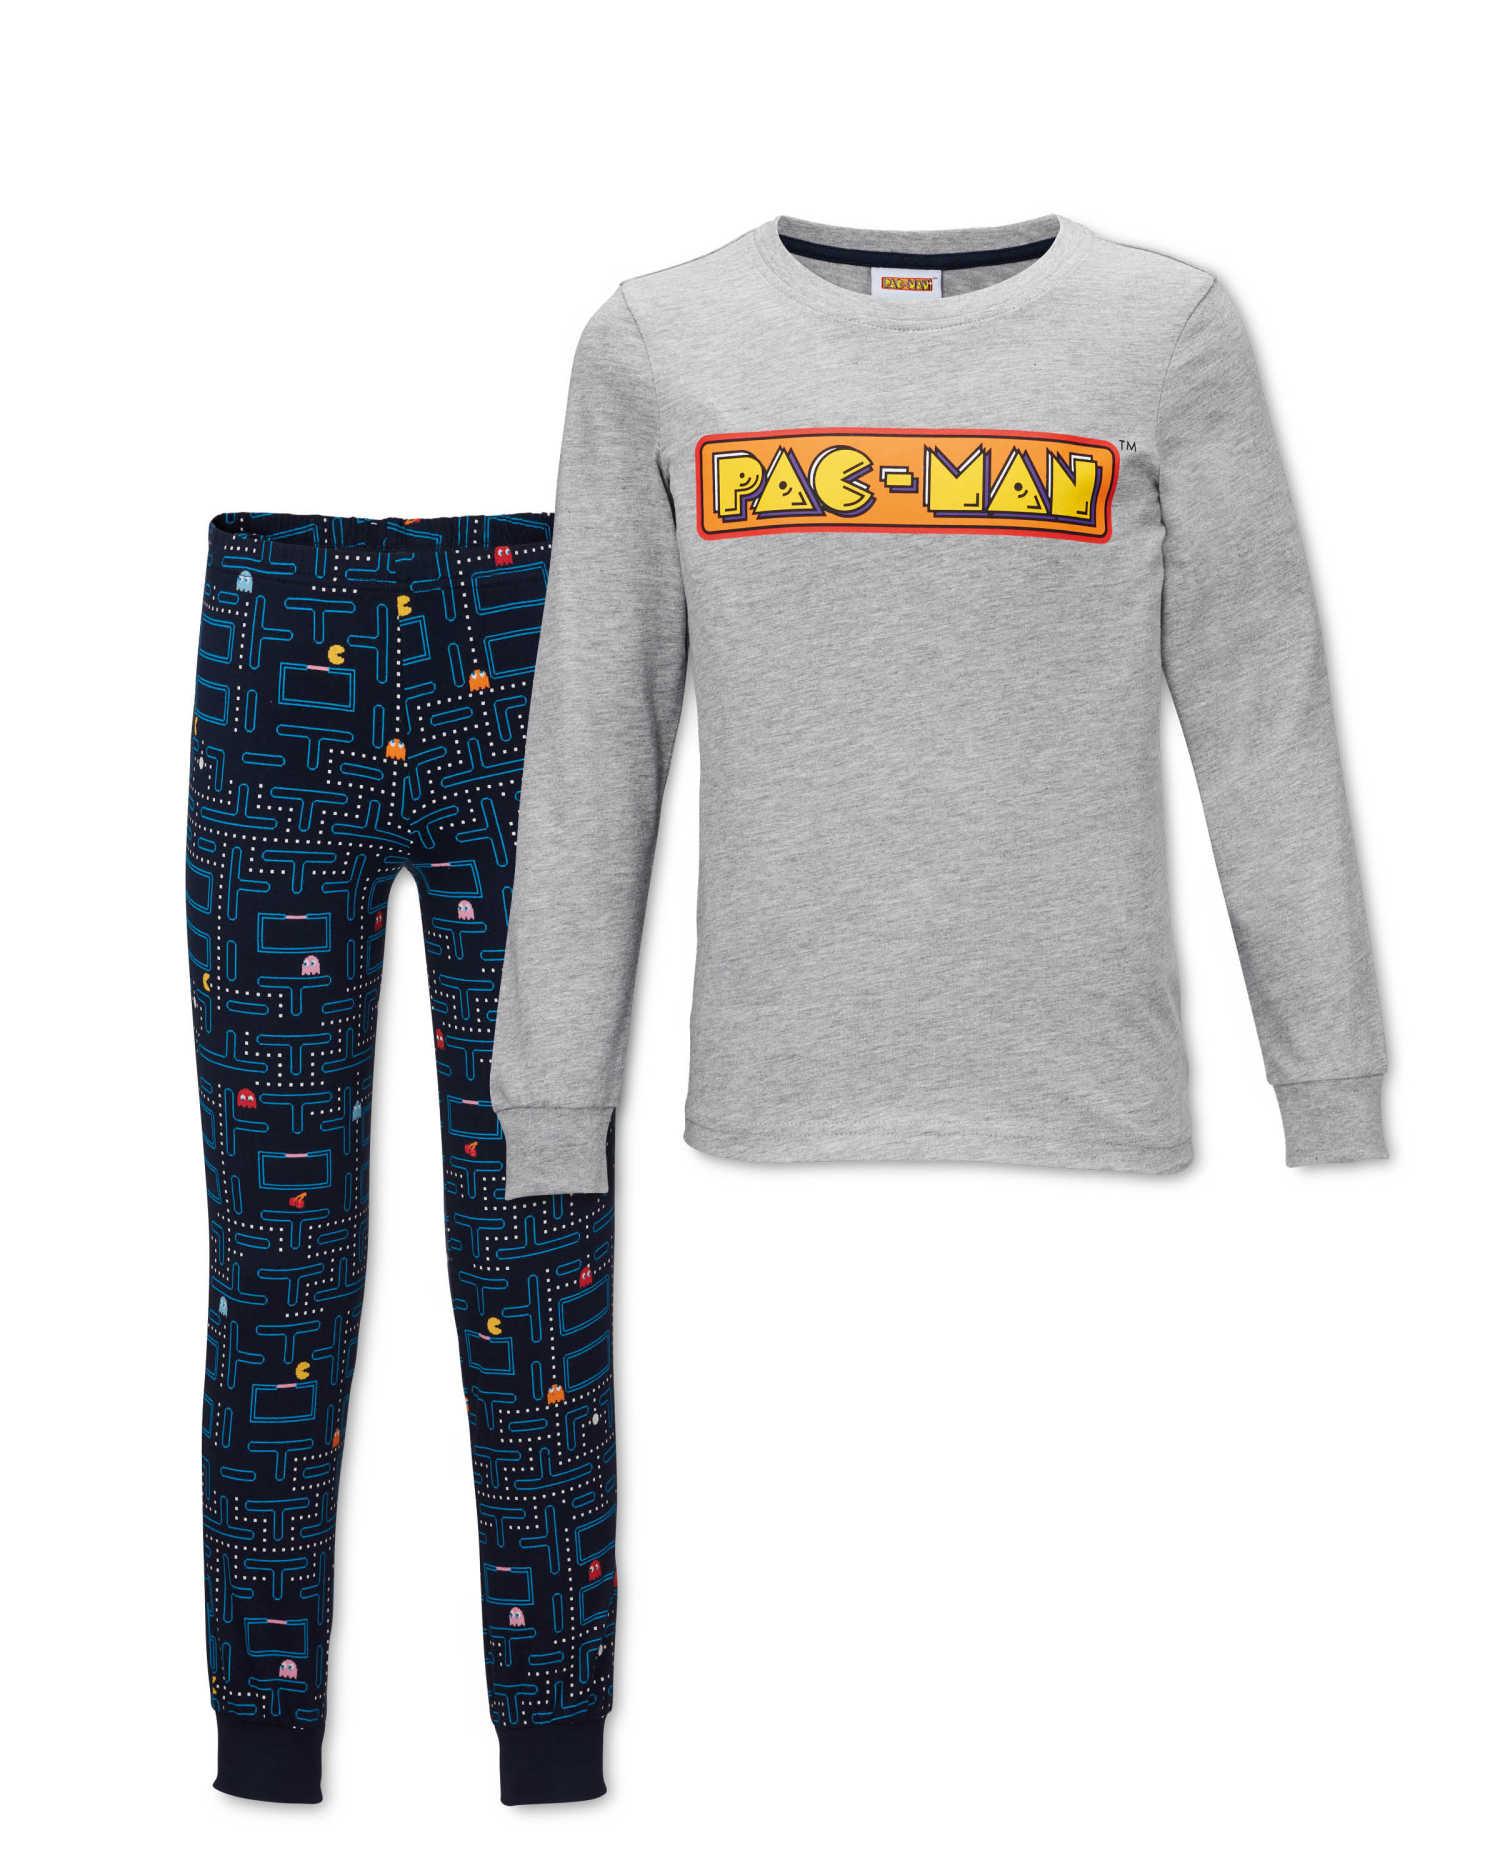 Kids PAC Man Pyjamas - £2.99 / £5.94 delivered @ Aldi